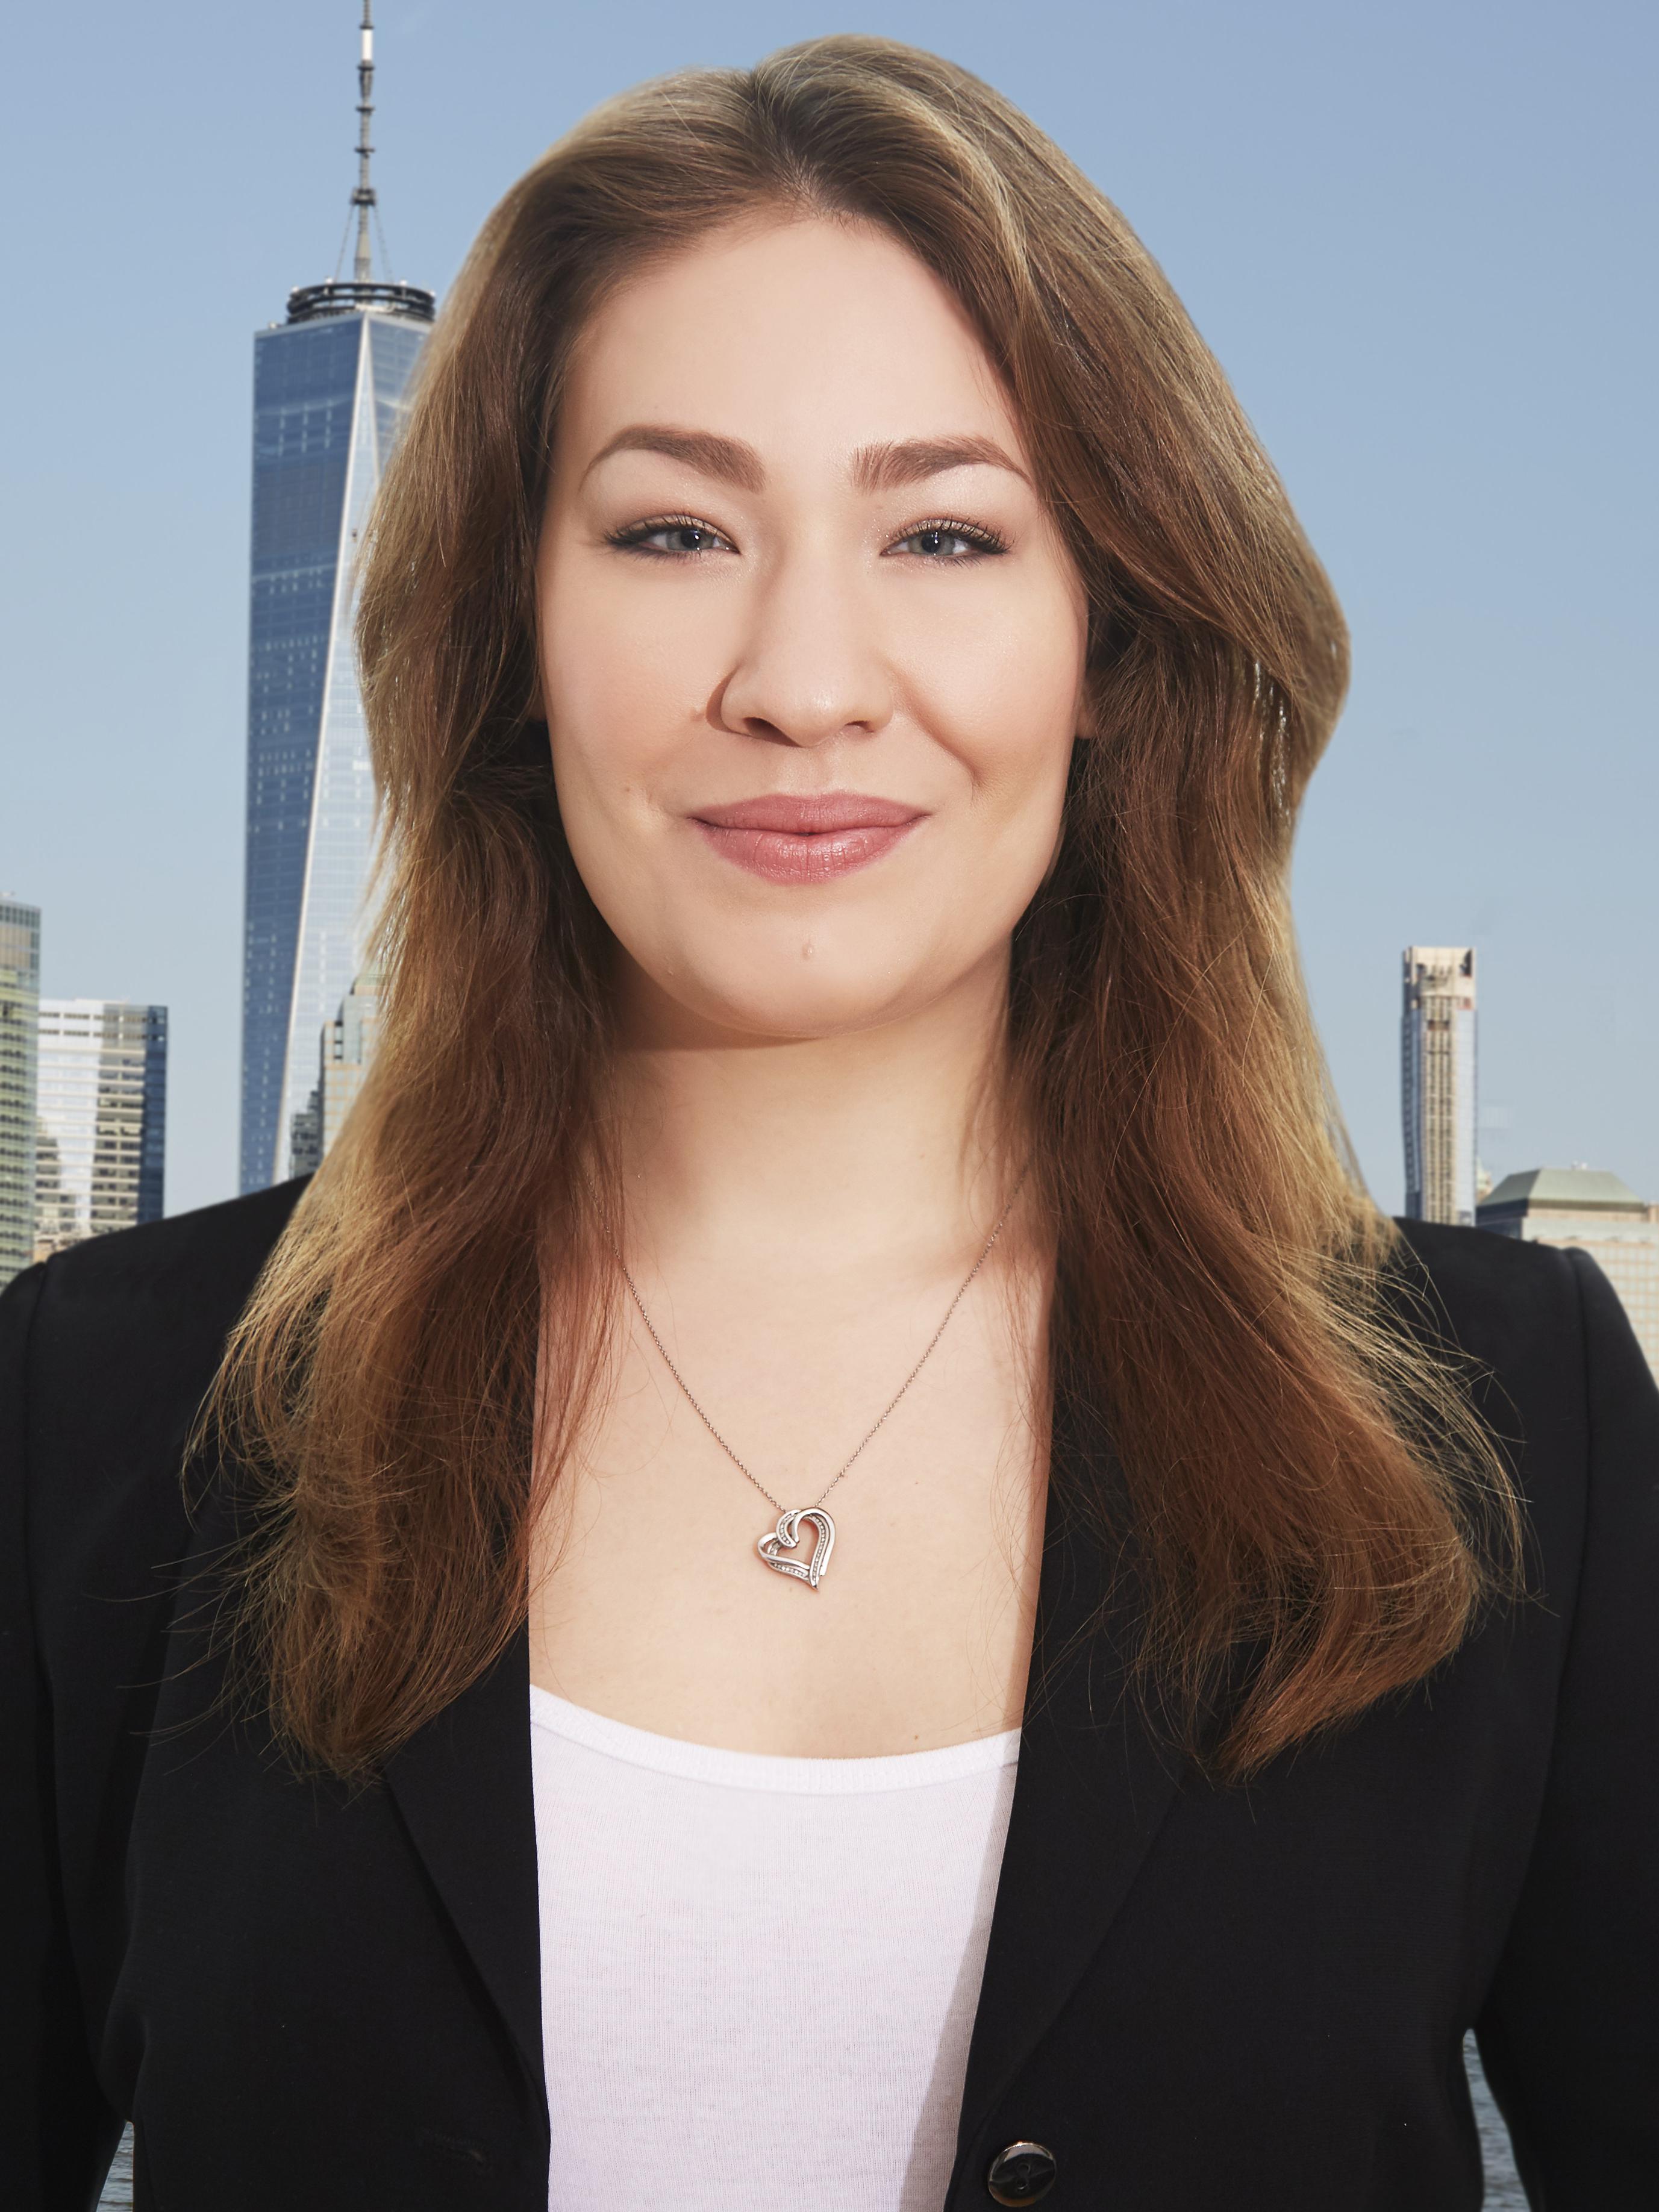 Sonia DaSilva